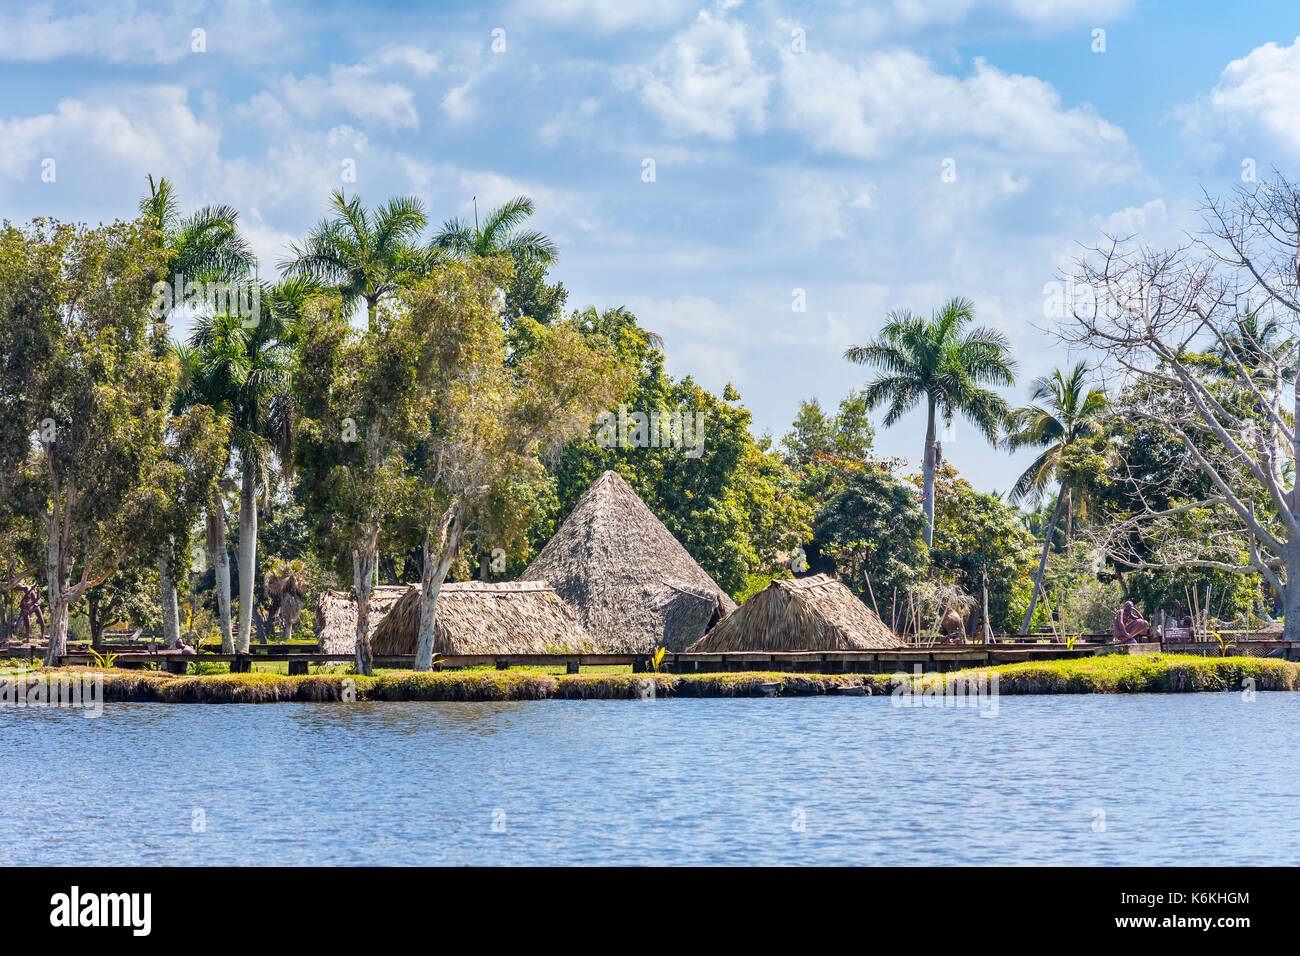 La Aldea Taina, a reconstructed pre-Columbian village with huts (bohios) on Guama, Laguno del Teroso, on the west coast of Cuba - Stock Image